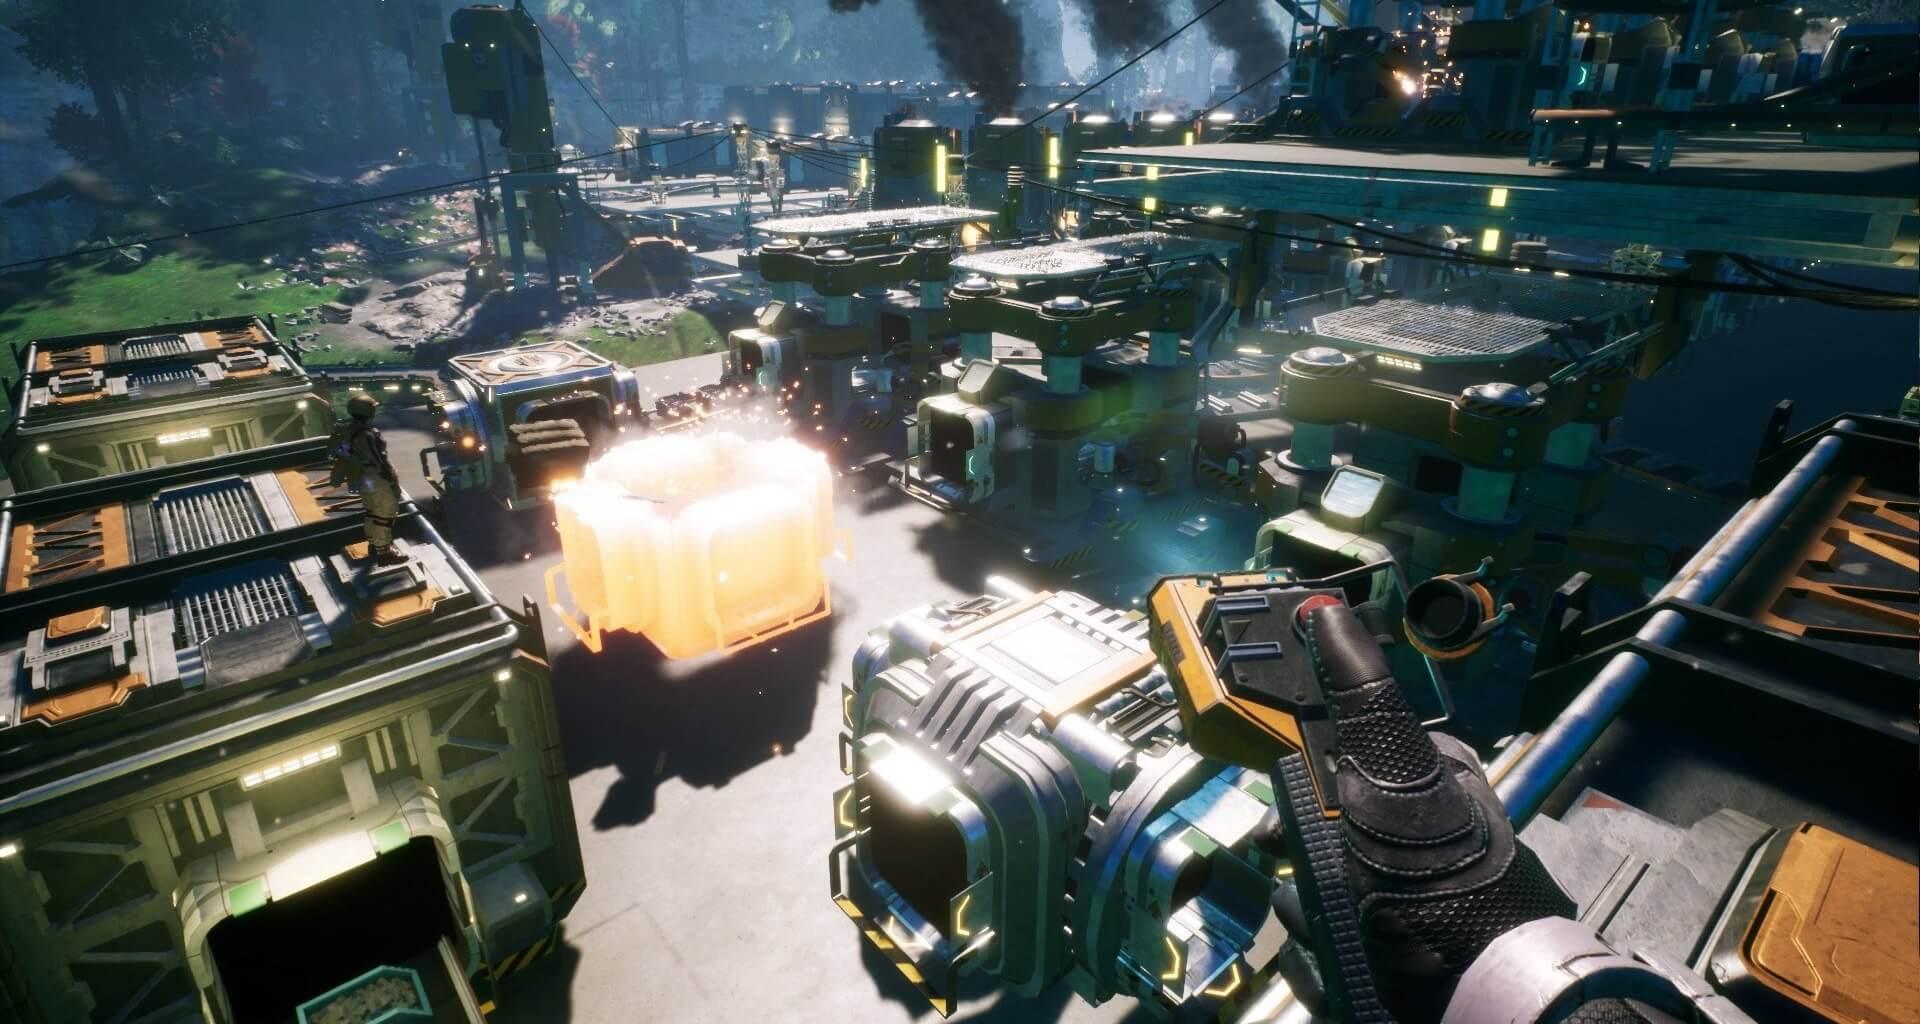 Coffee Stain Studios' Satisfactory receives its third major update, is coming soon on Steam